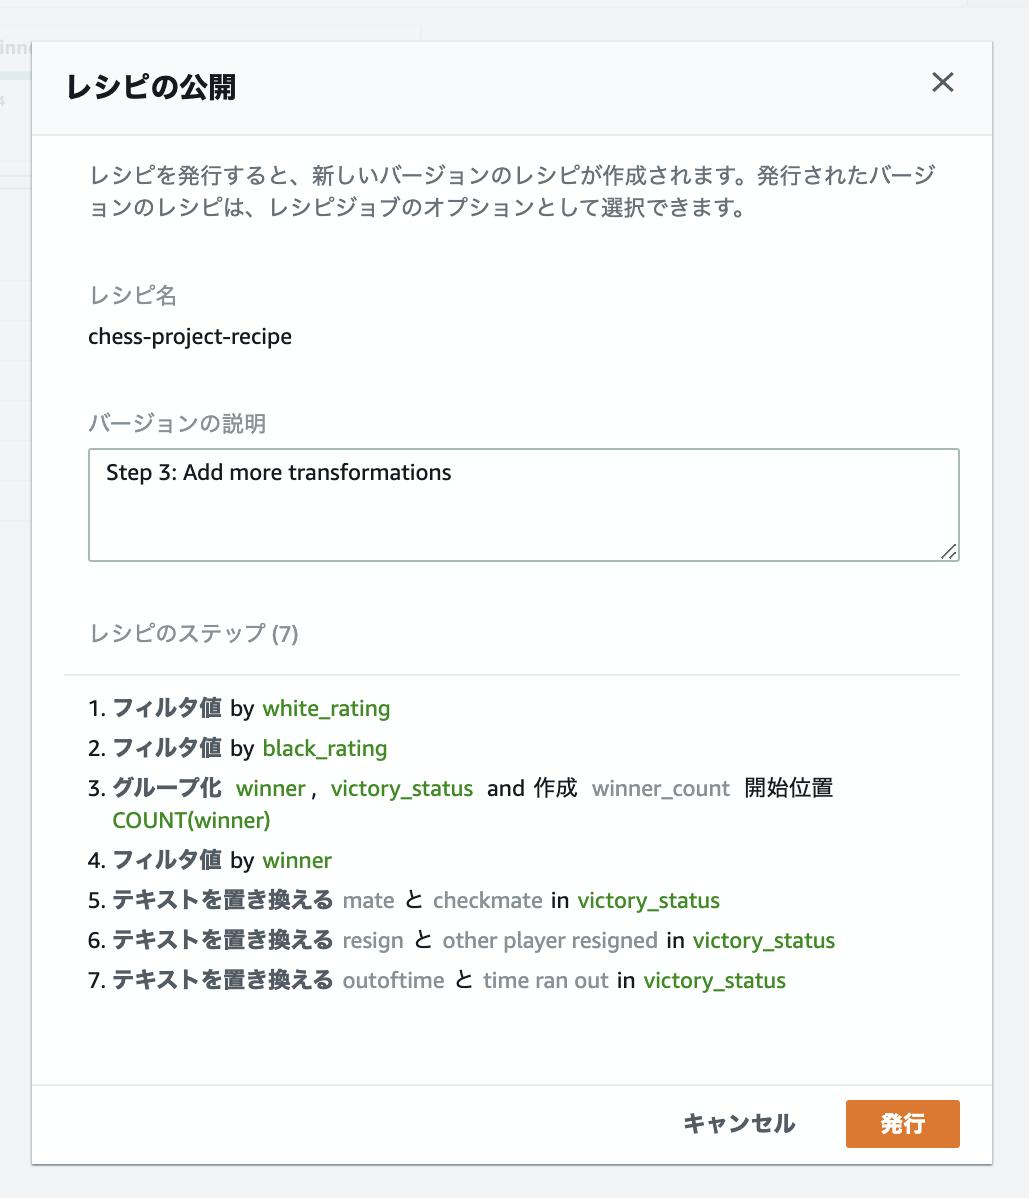 f:id:swx-tamura:20210209094337p:plain